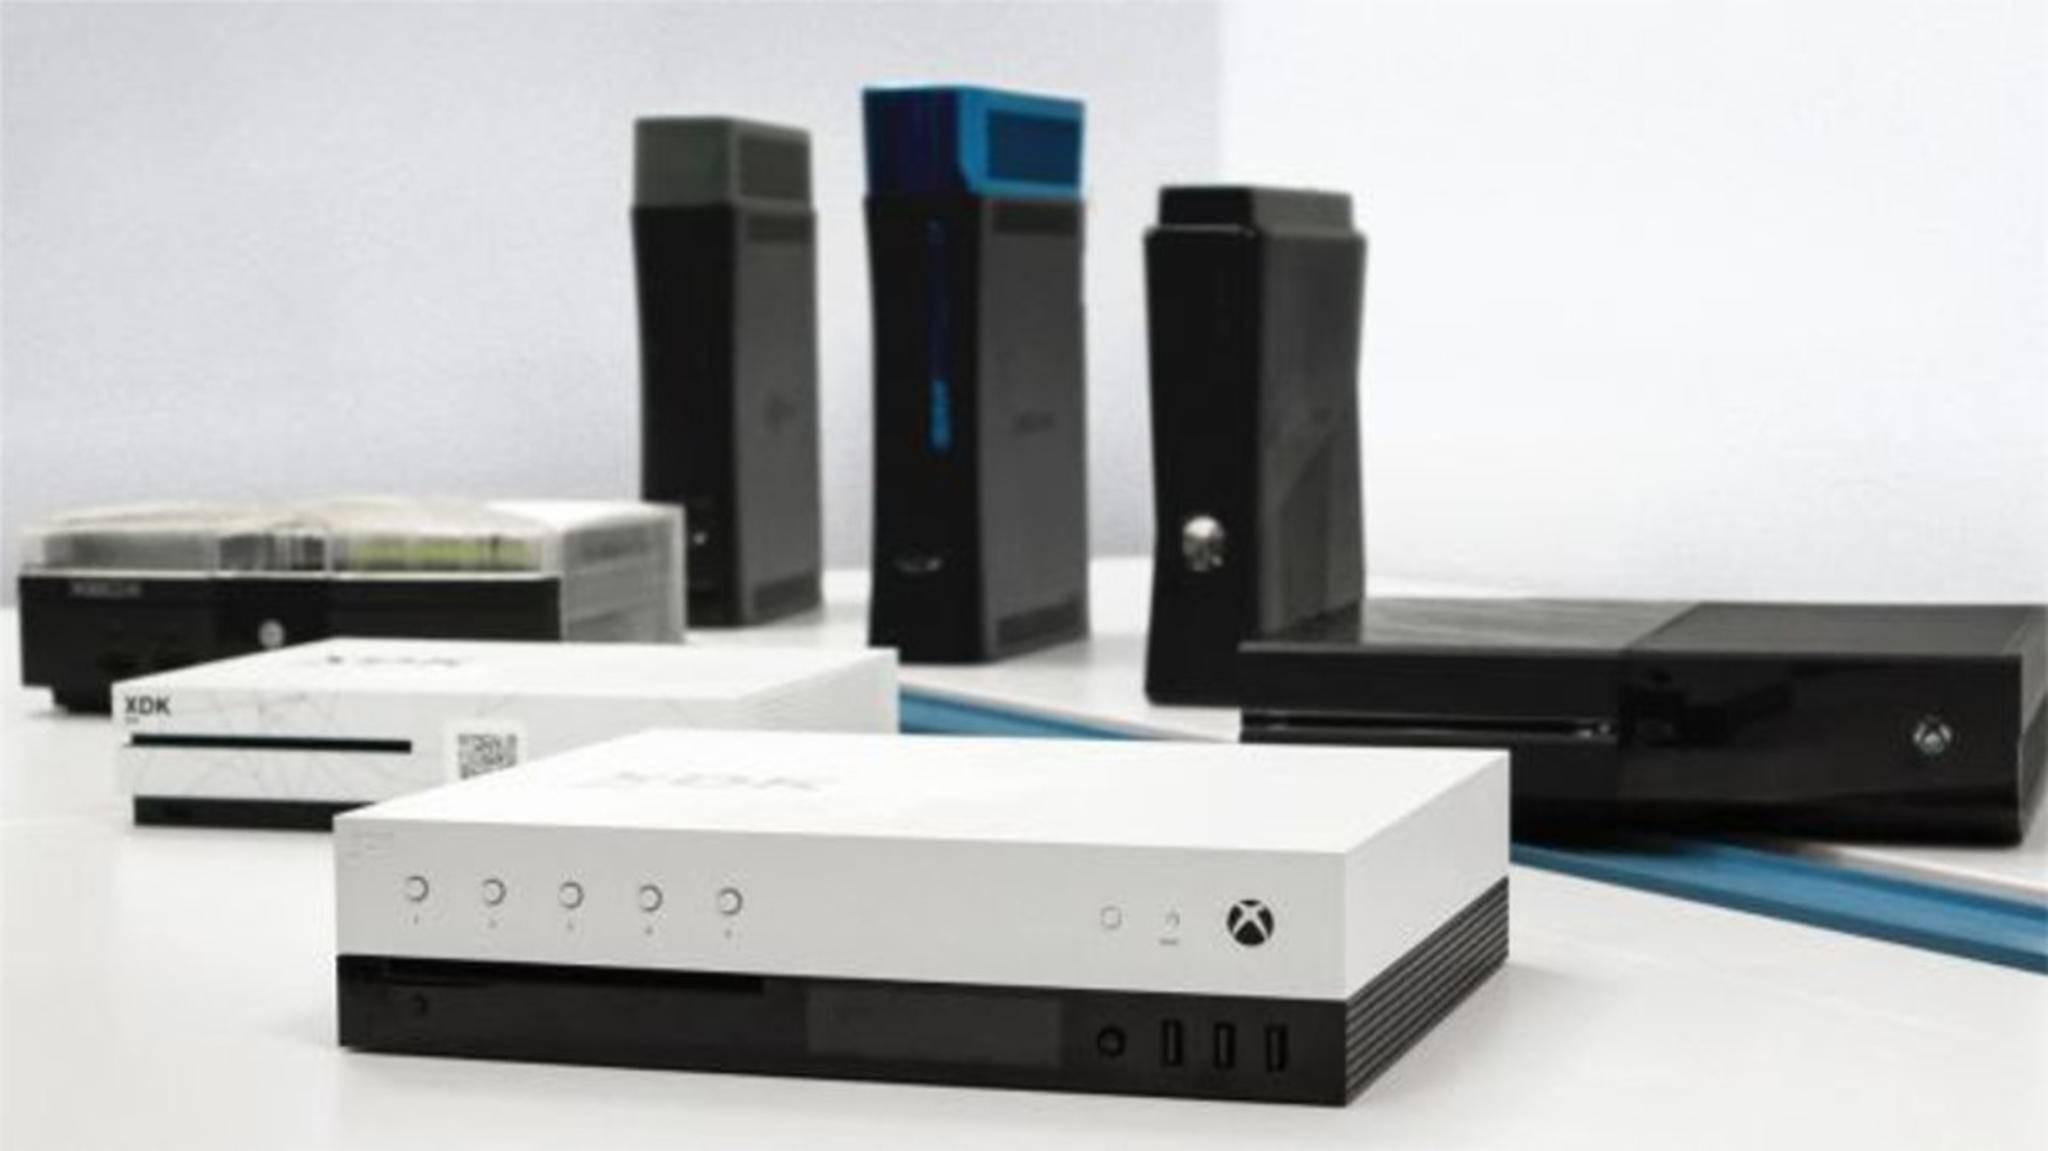 So sieht die Xbox Scorpio-Entwicklerversion aus.